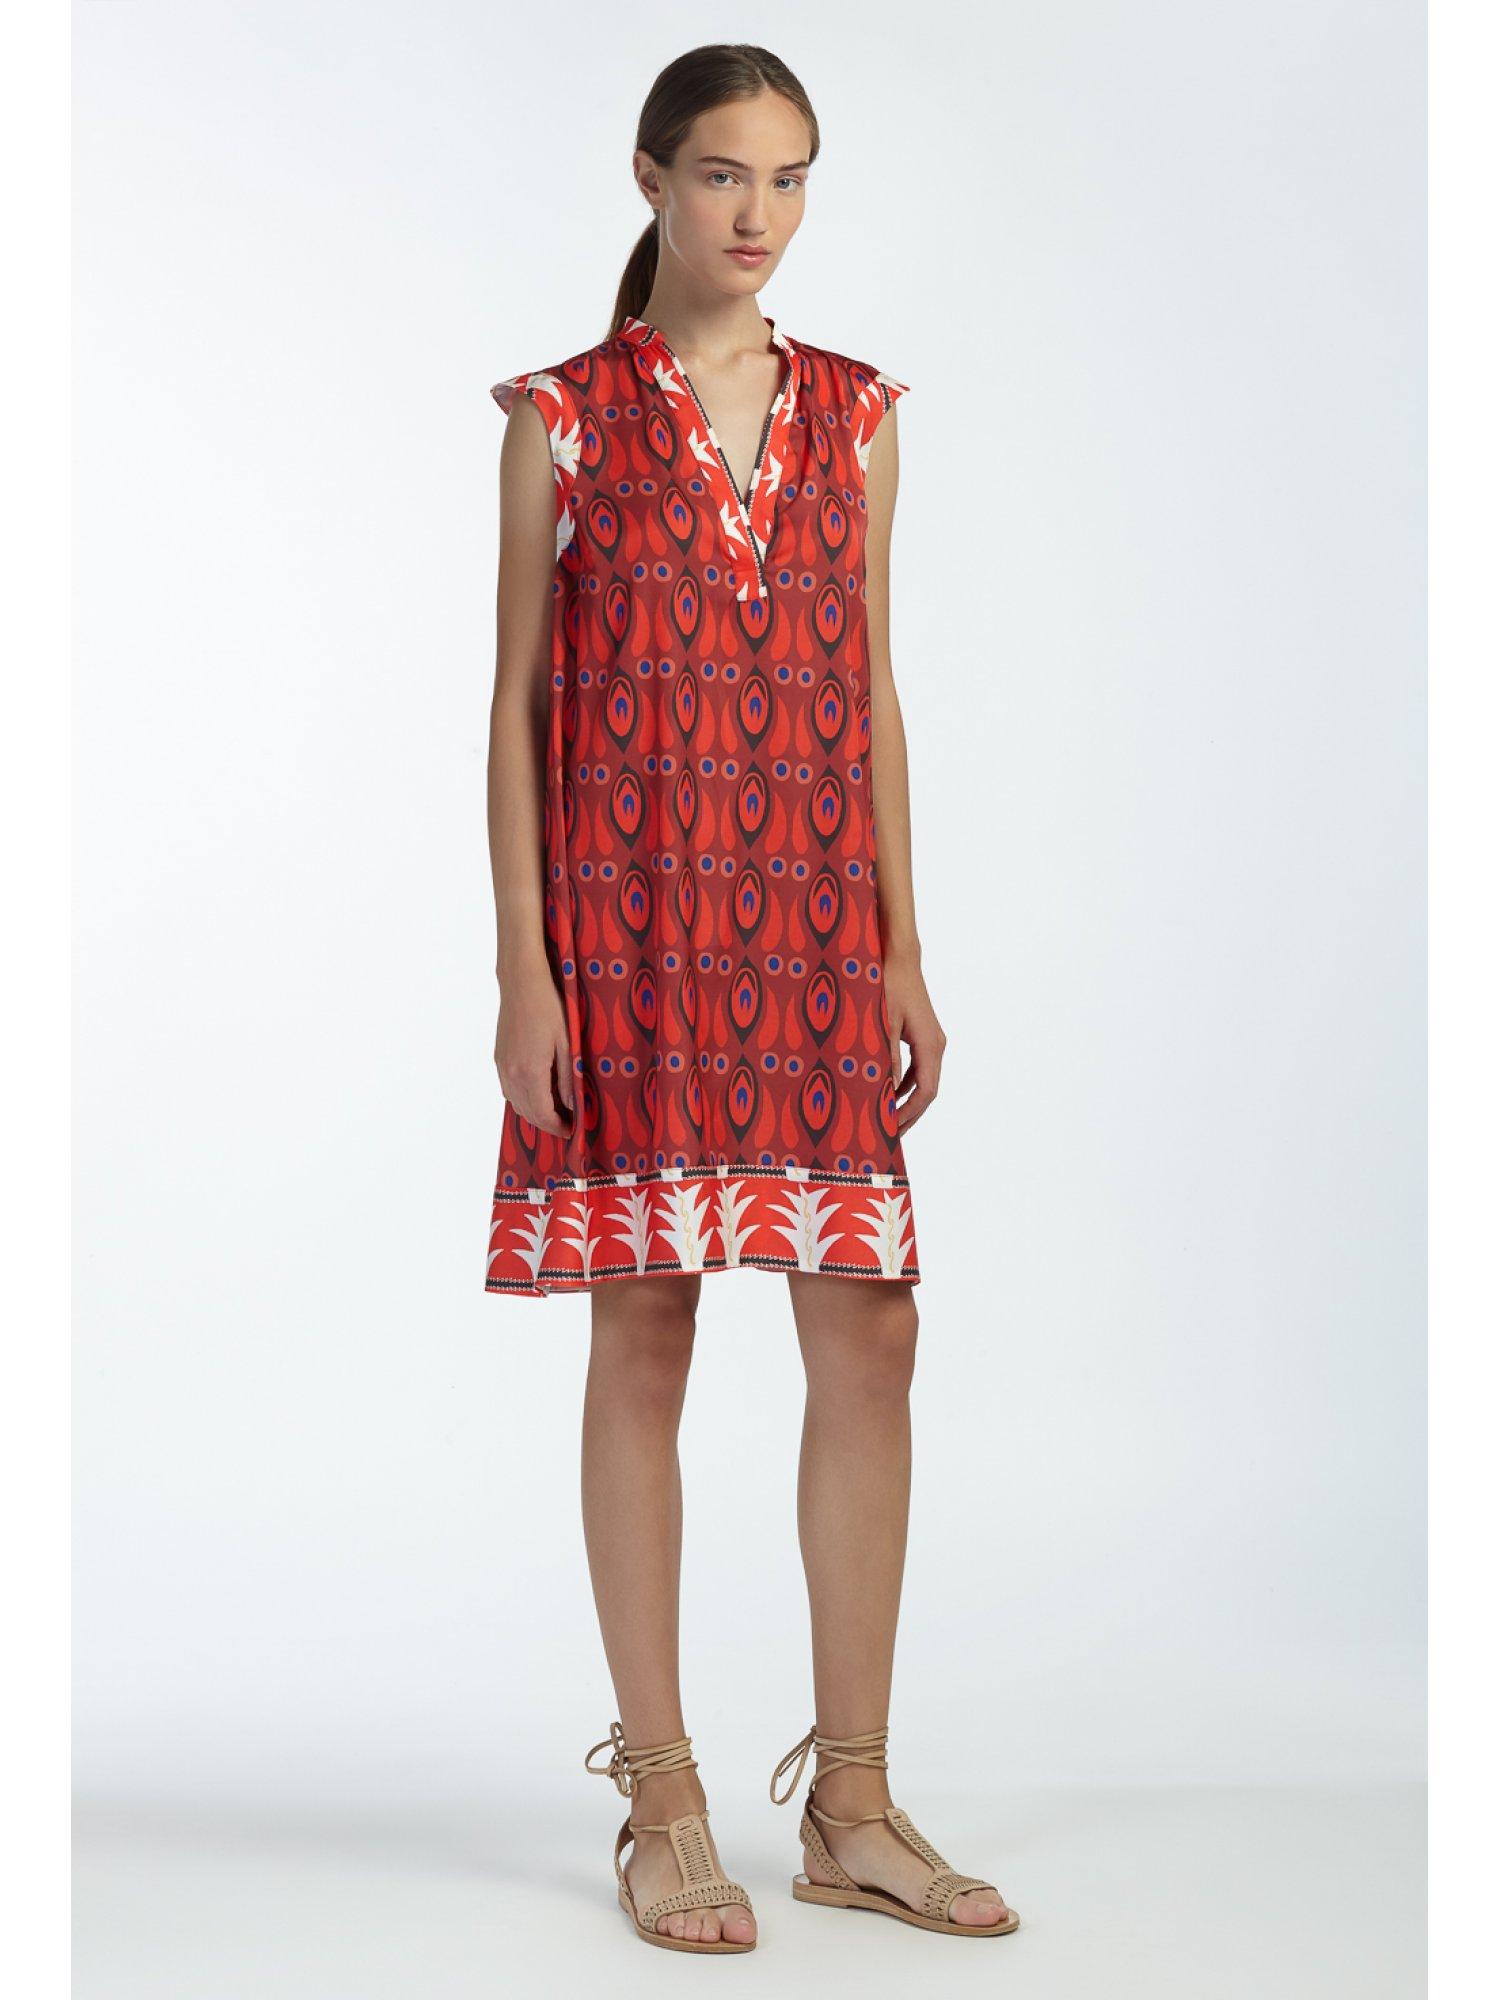 LEUKIPPE DRESS